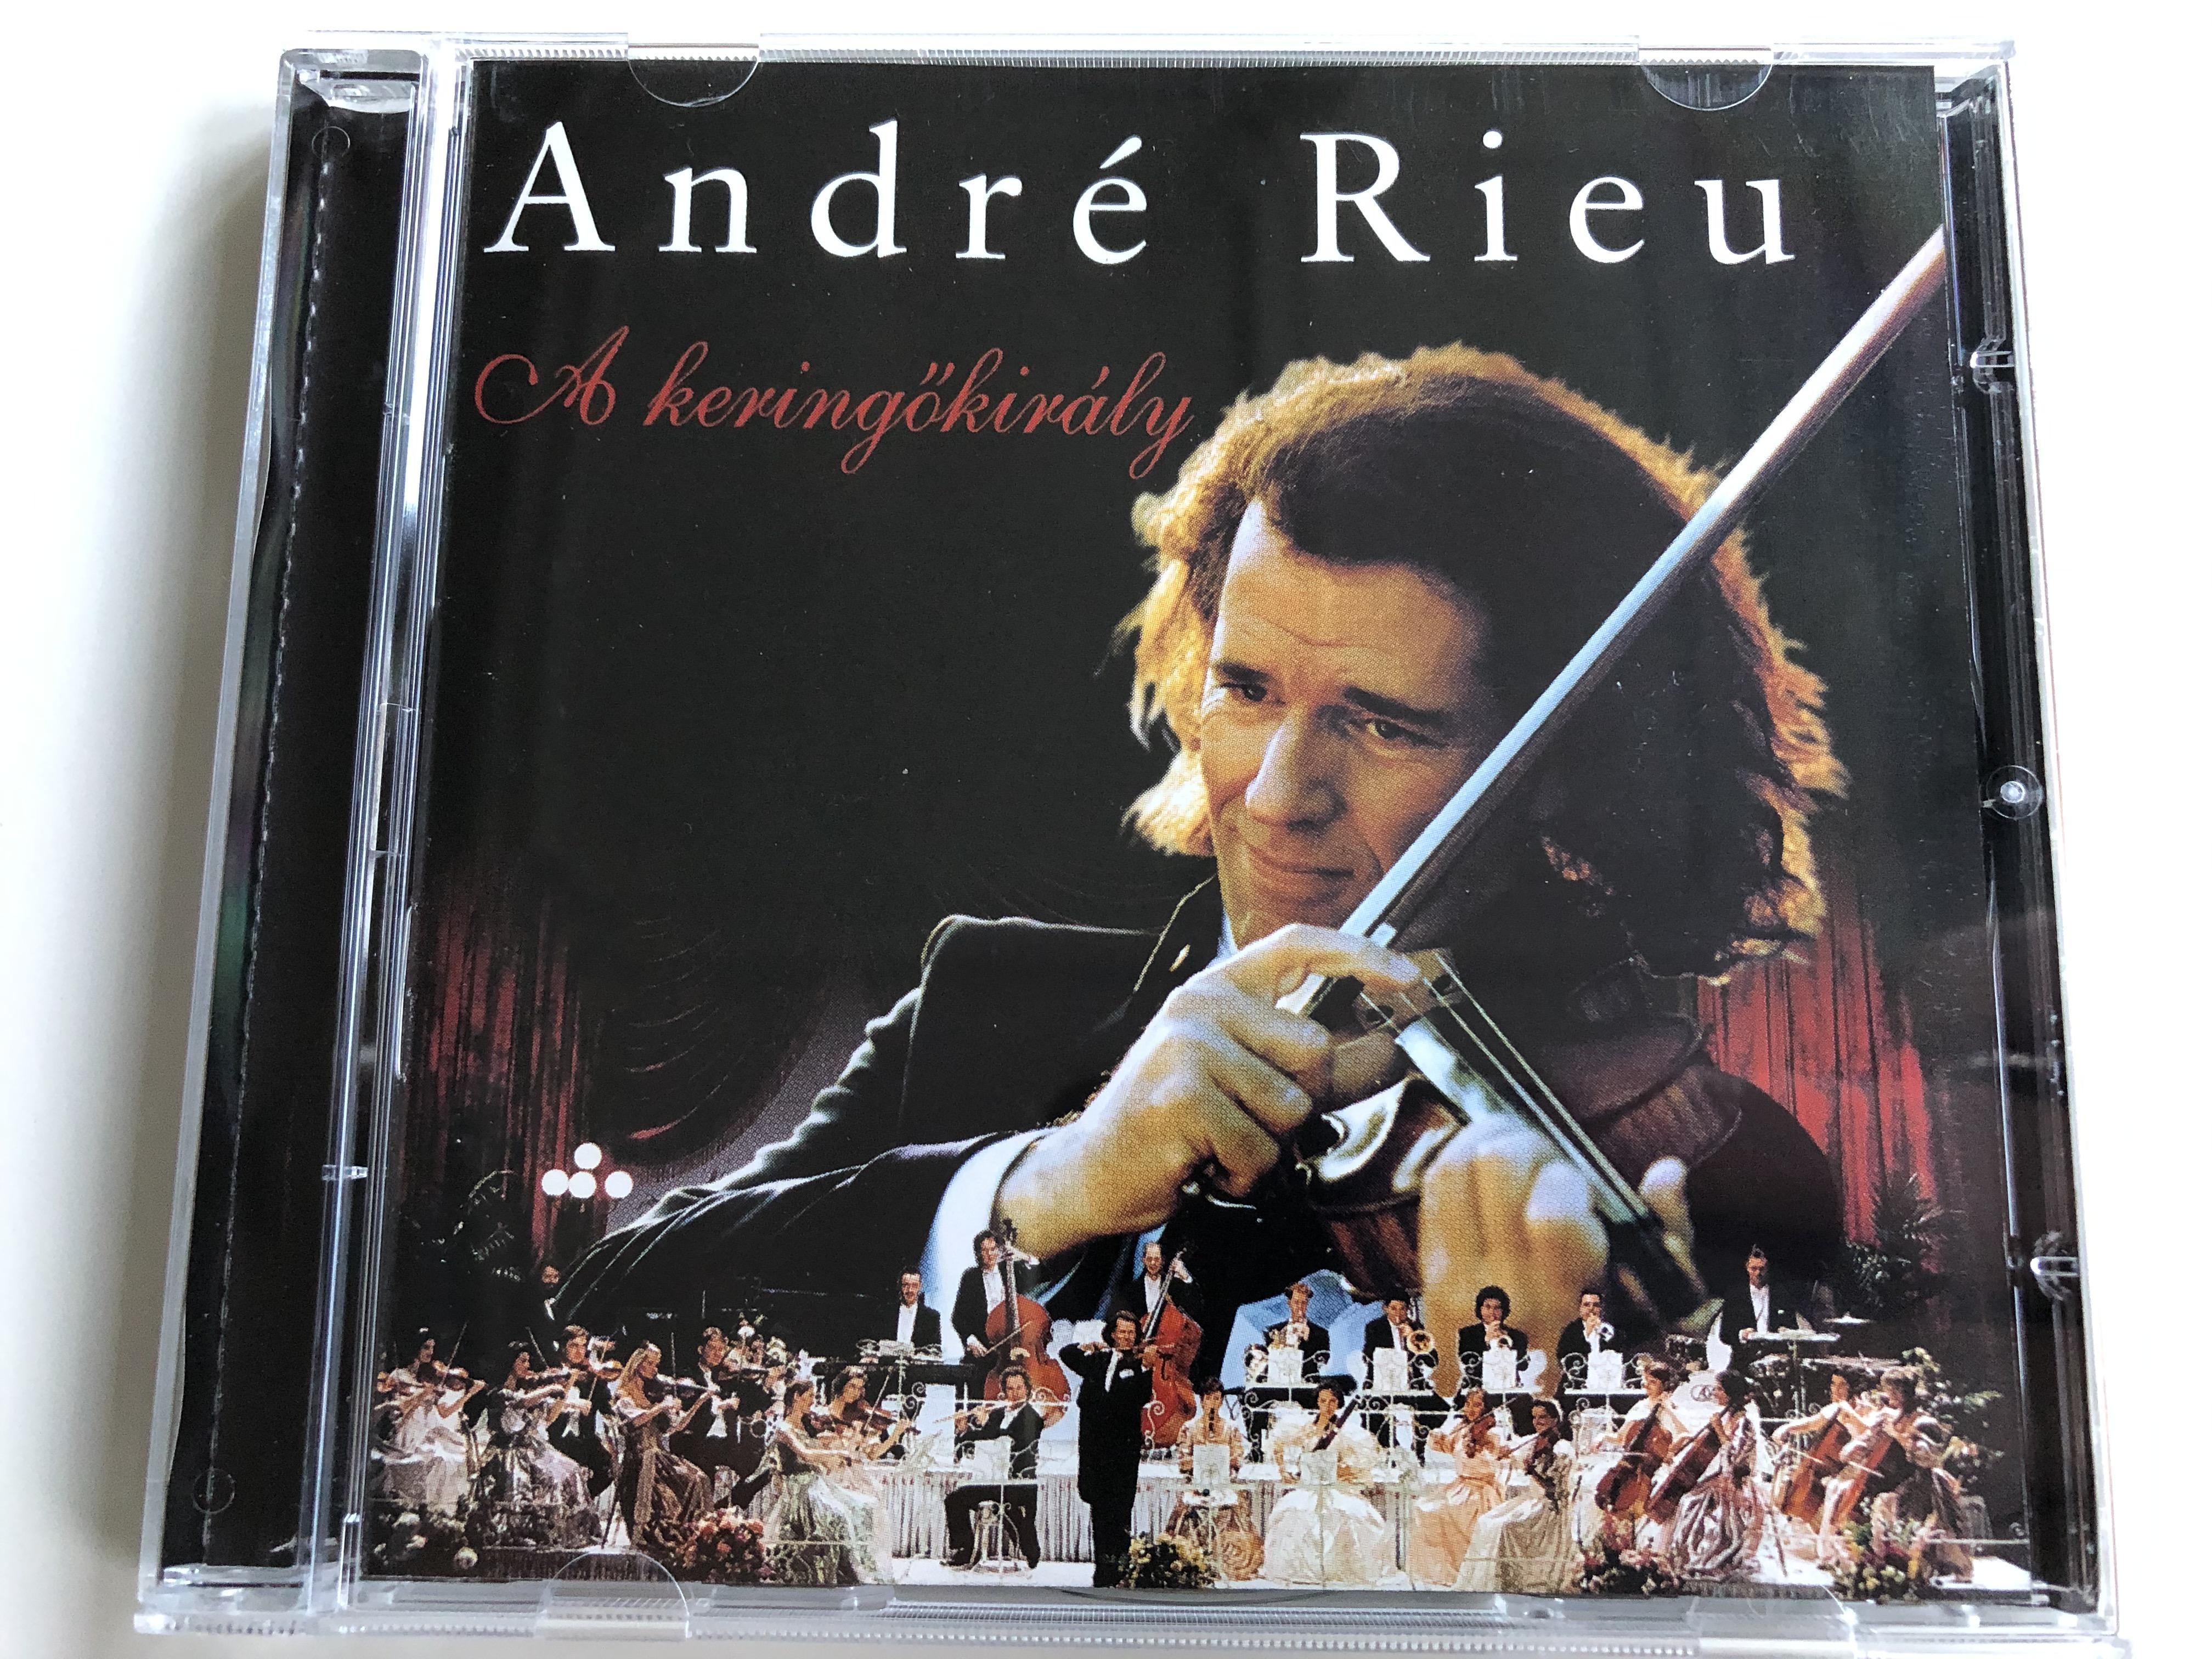 andr-rieu-a-keringokiraly-philips-audio-cd-1998-522-933-2-1-.jpg